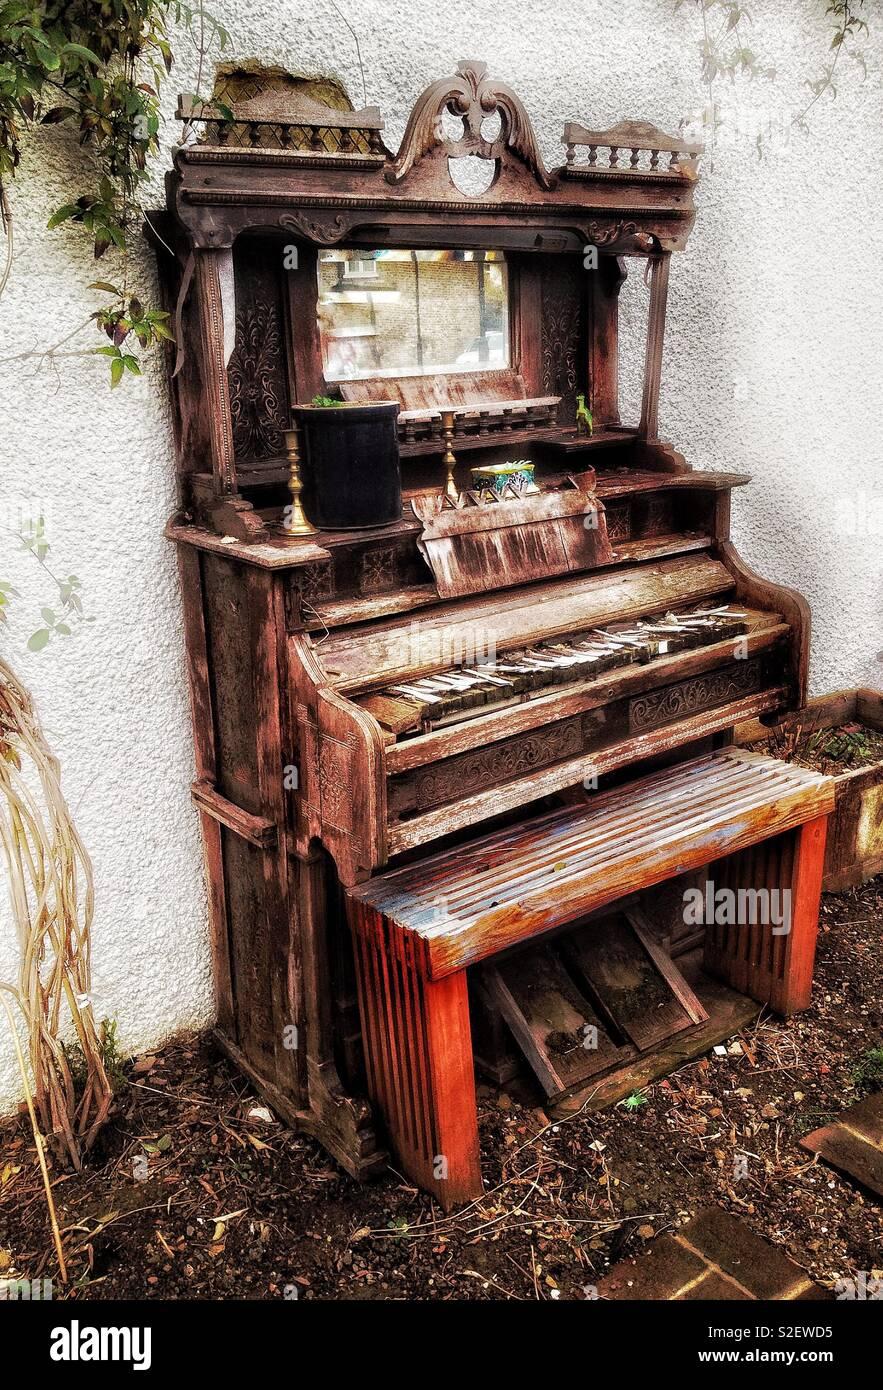 Sad old dilapidated pump organ being used as unusual garden furniture - Stock Image